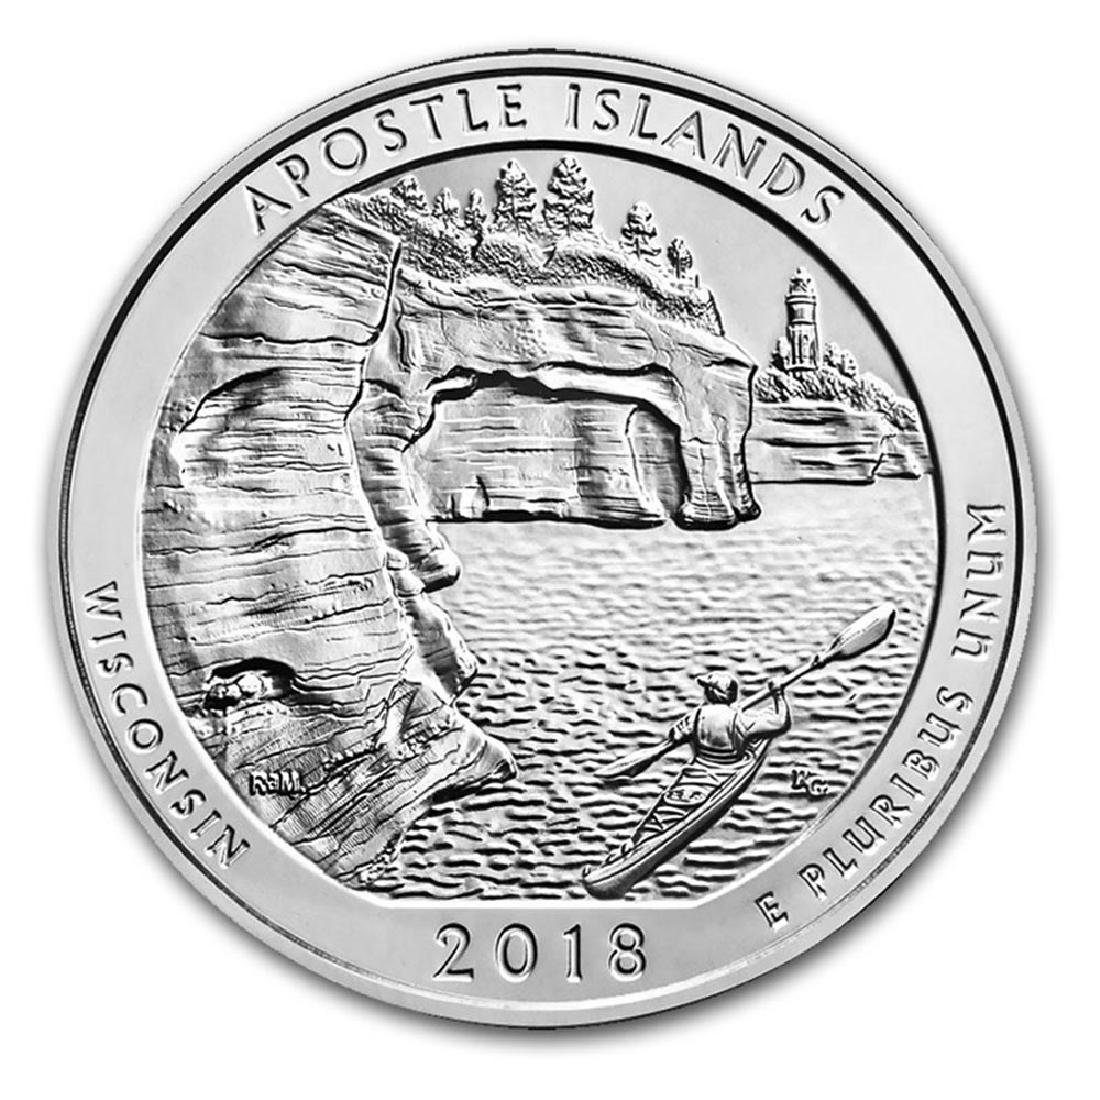 2018 Silver 5oz. Apostle Islands National Lakeshore ATB